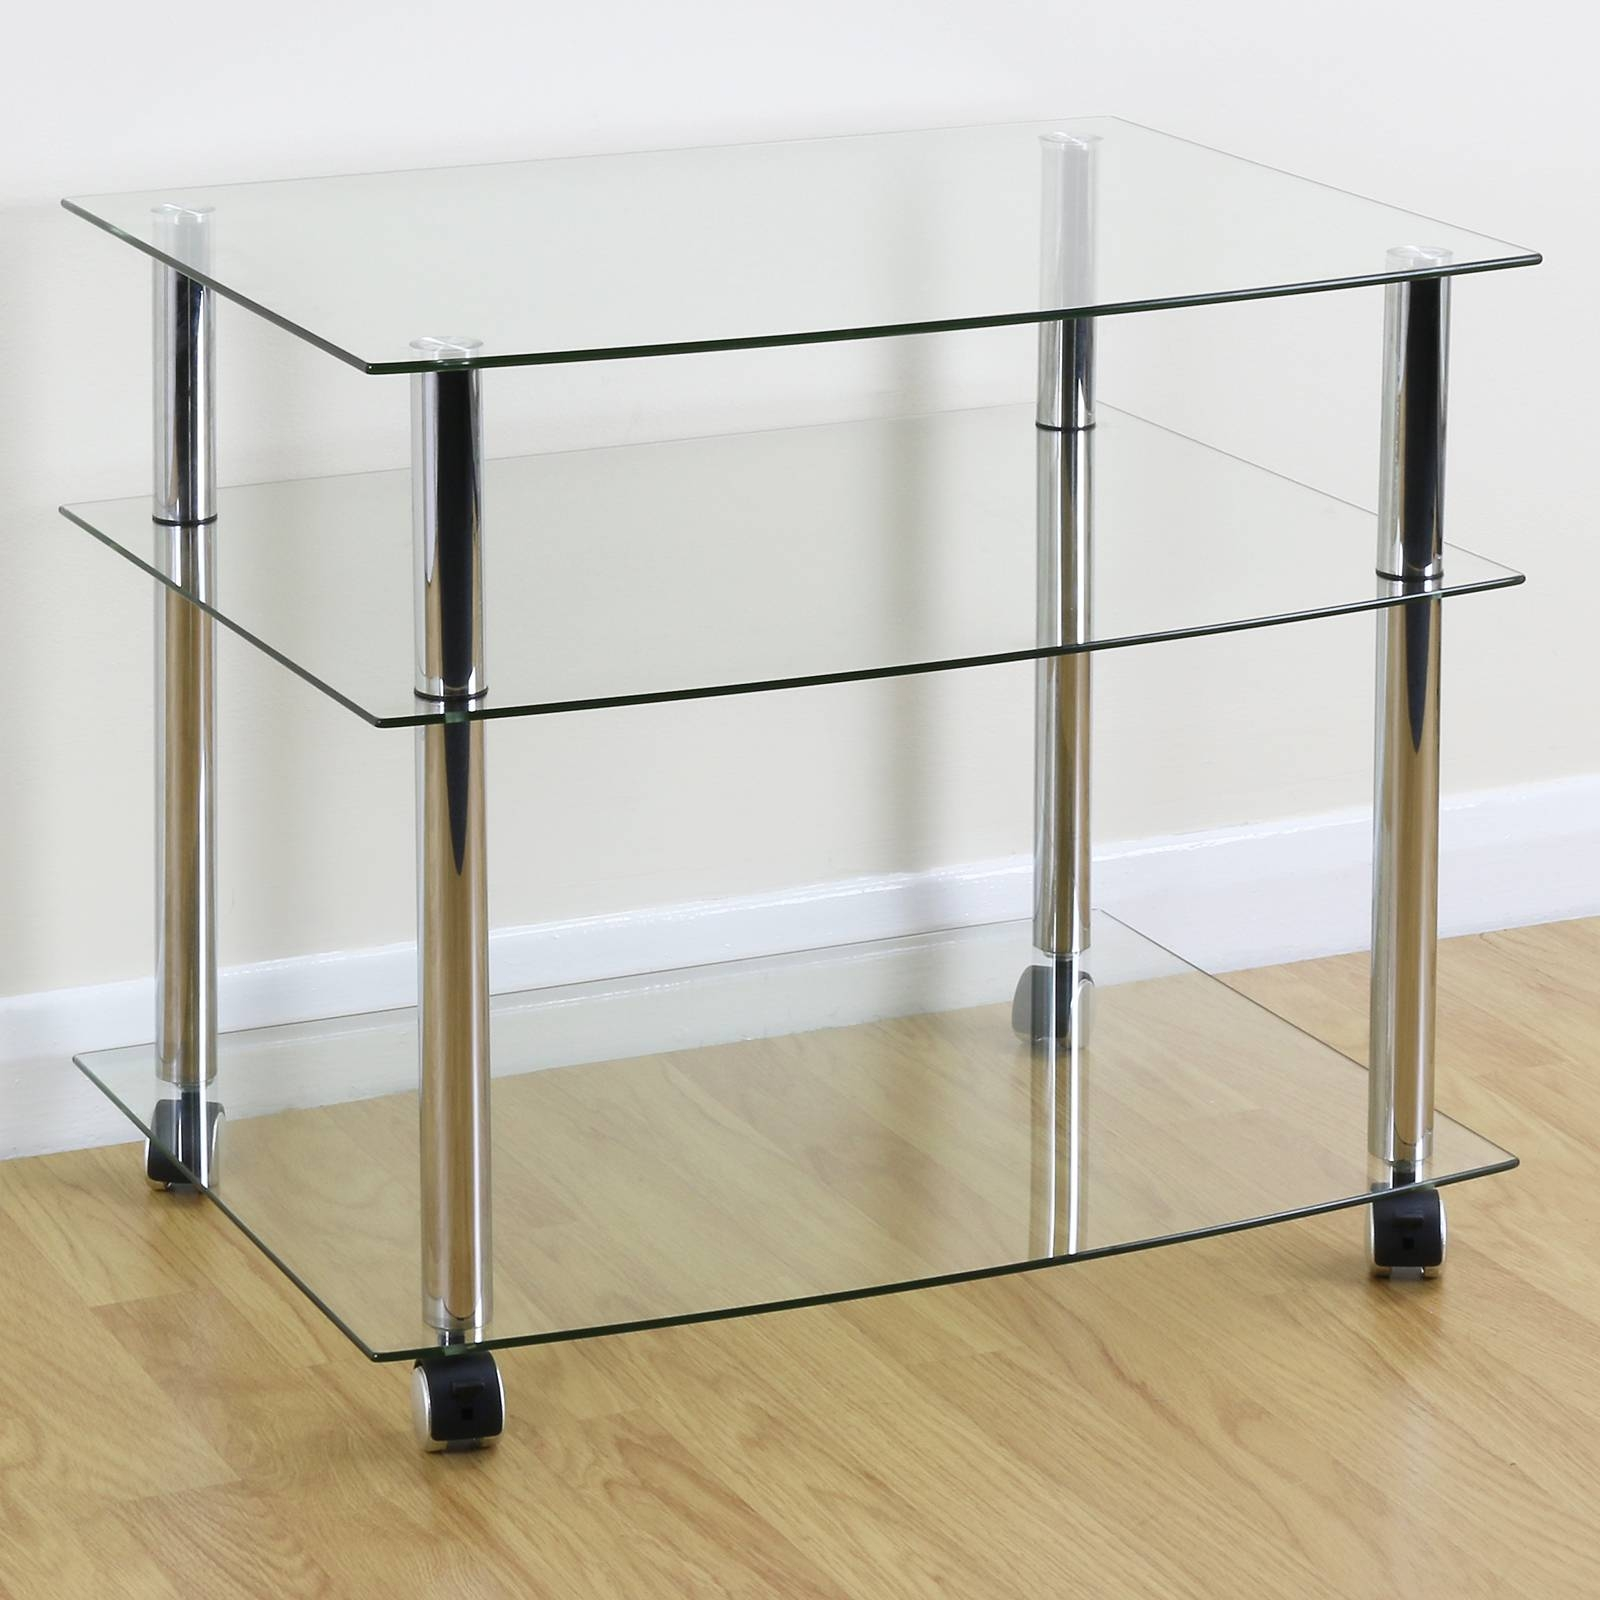 Mobile Chrome & Clear Glass 3 Shelf Tv Stand/trolley/unit With with Clear Glass Tv Stand (Image 9 of 15)